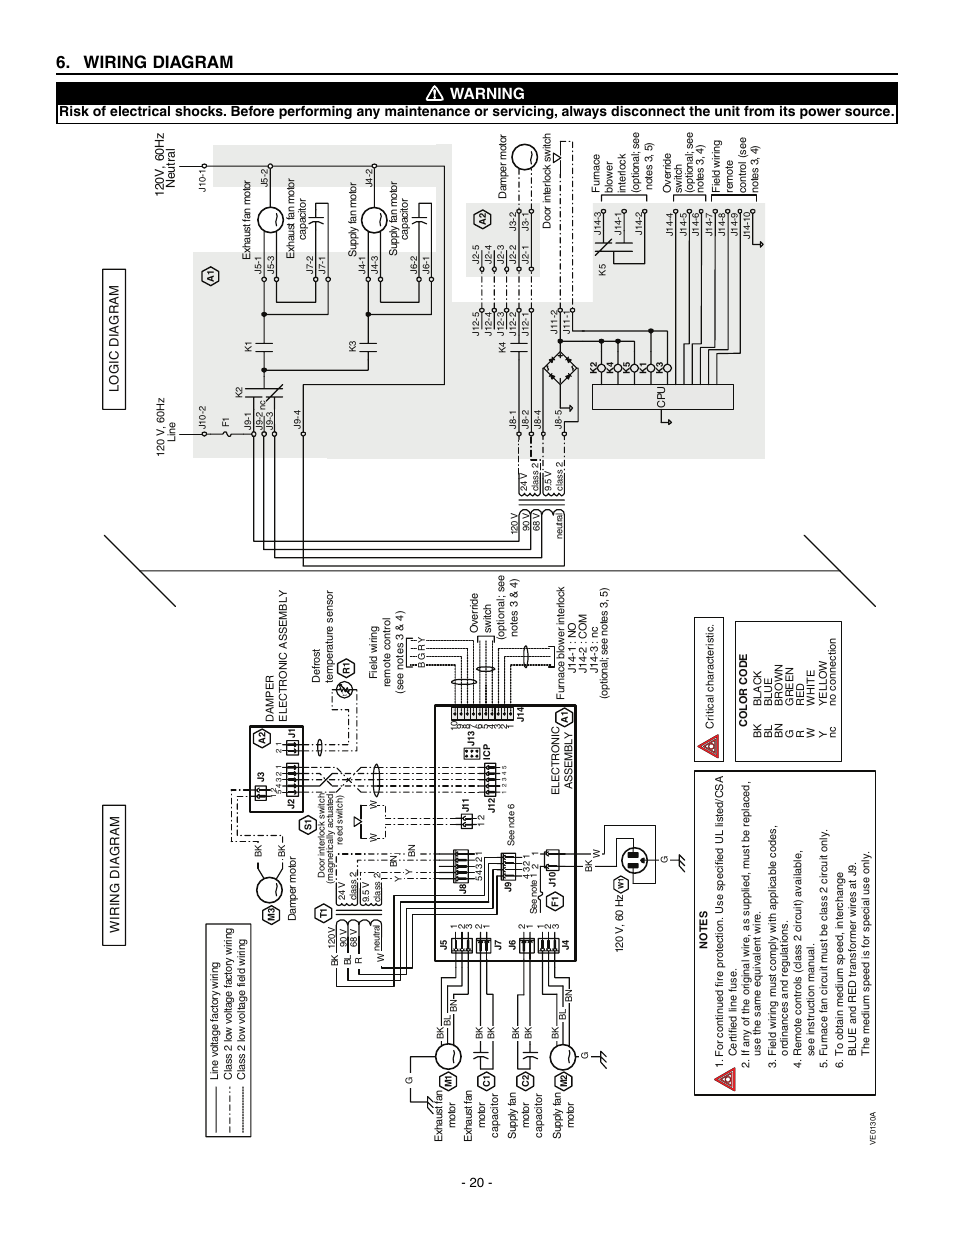 Diagram Nissan Note User Wiring Diagram Full Version Hd Quality Wiring Diagram My Diagrams Carpakoi It